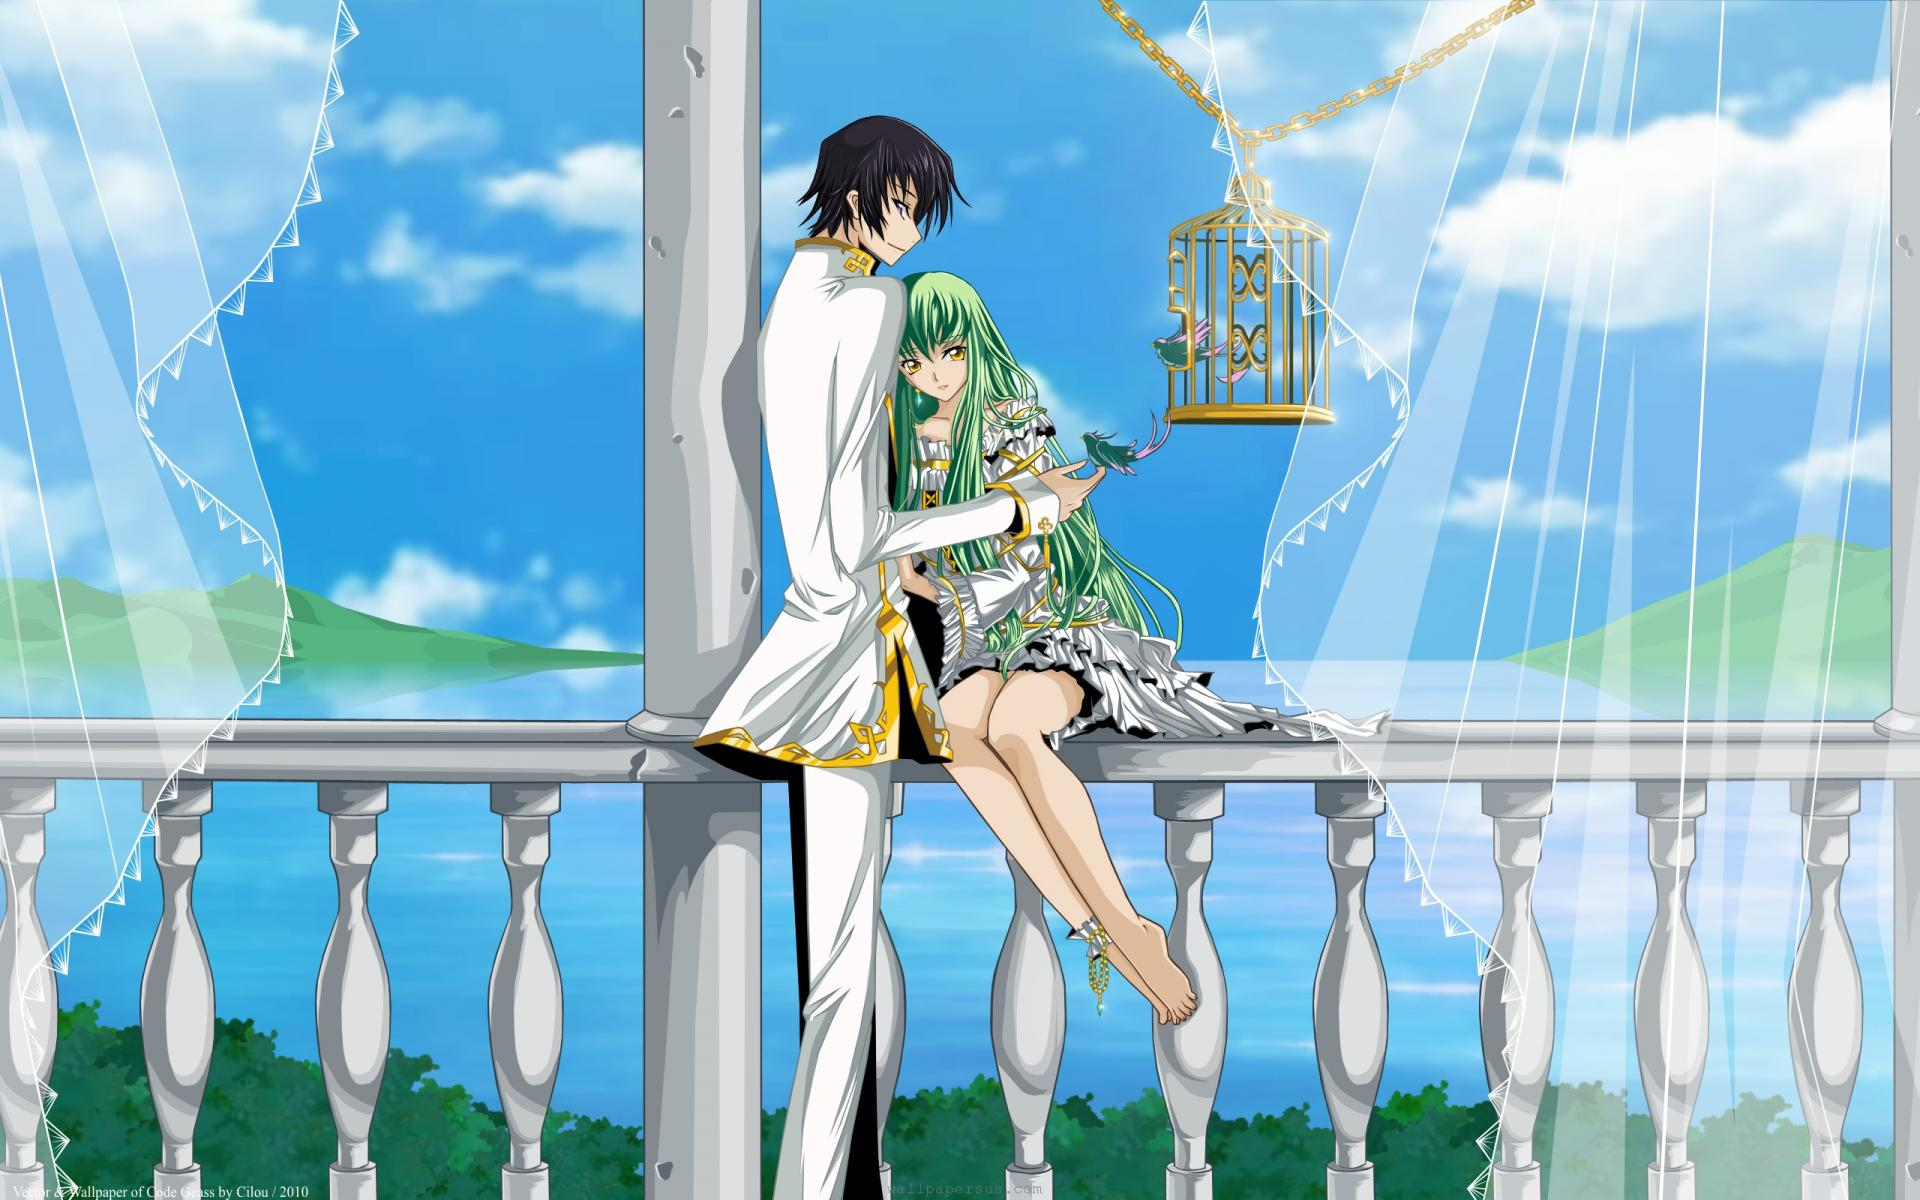 Animax Cartoon Wallpaper anime romance love wallpapers - top free anime romance love